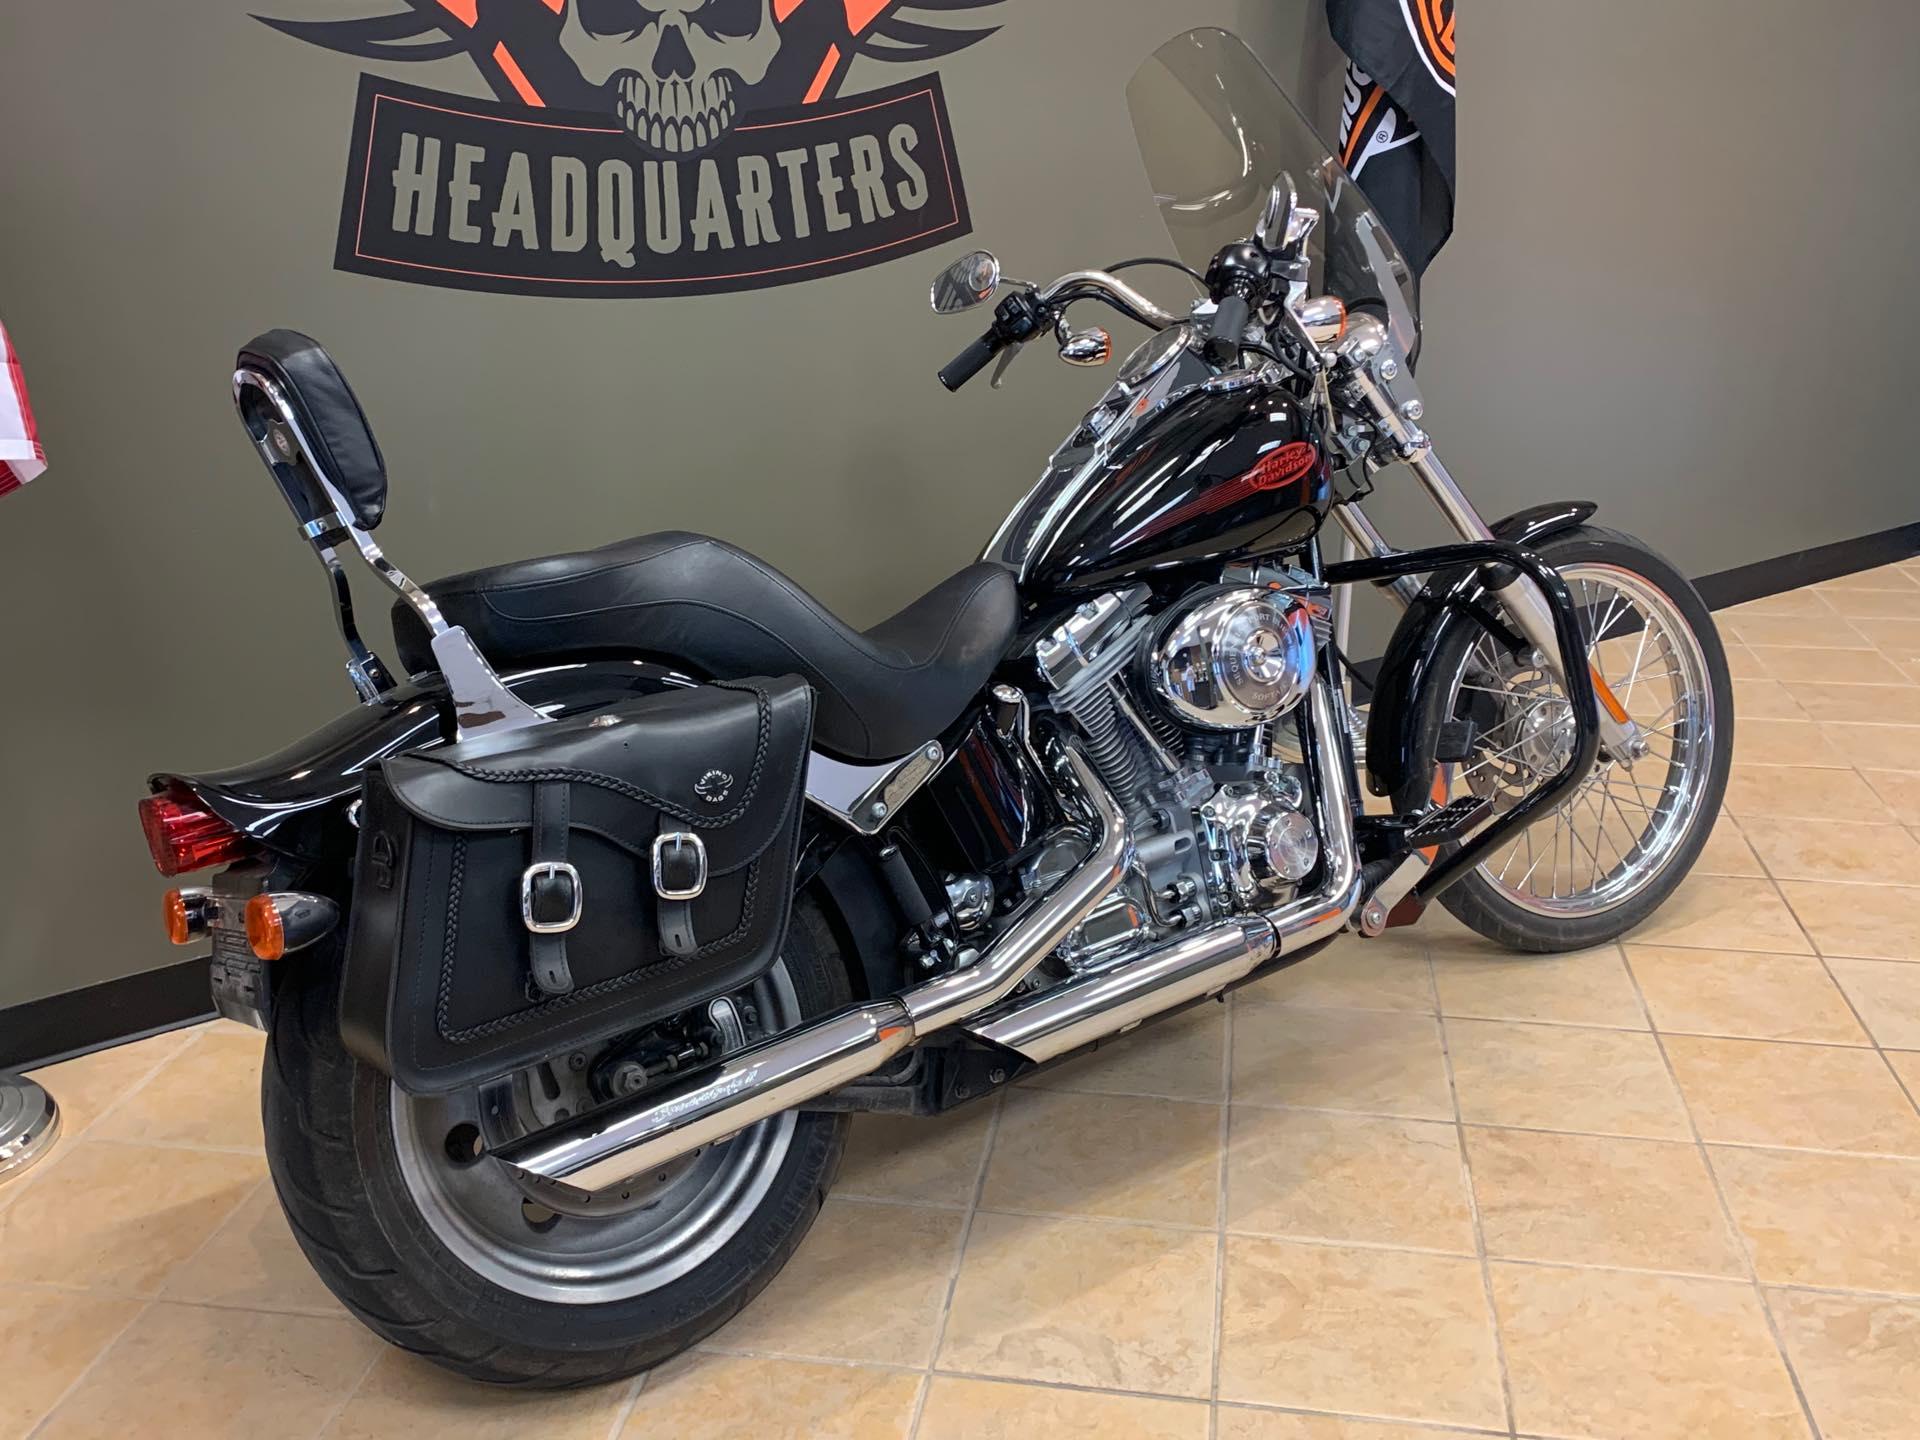 2006 Harley-Davidson Softail Standard at Loess Hills Harley-Davidson